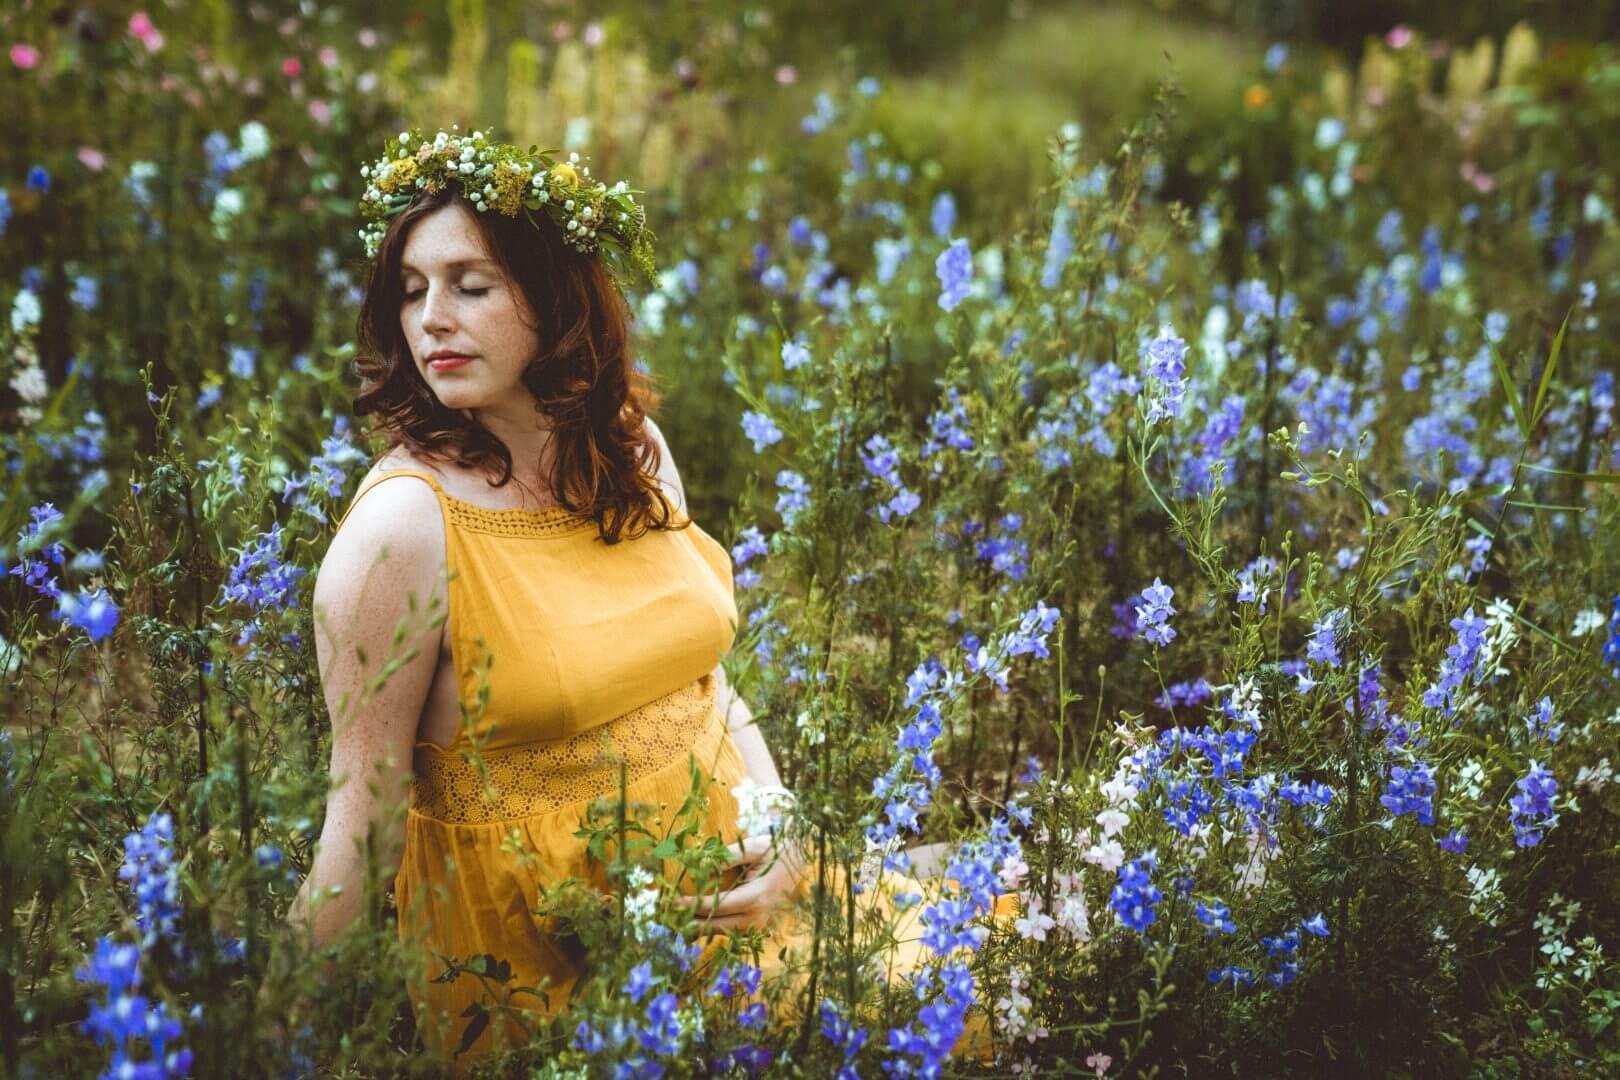 Schwangere in gelbem Kleid sitzt in Blumenfeld